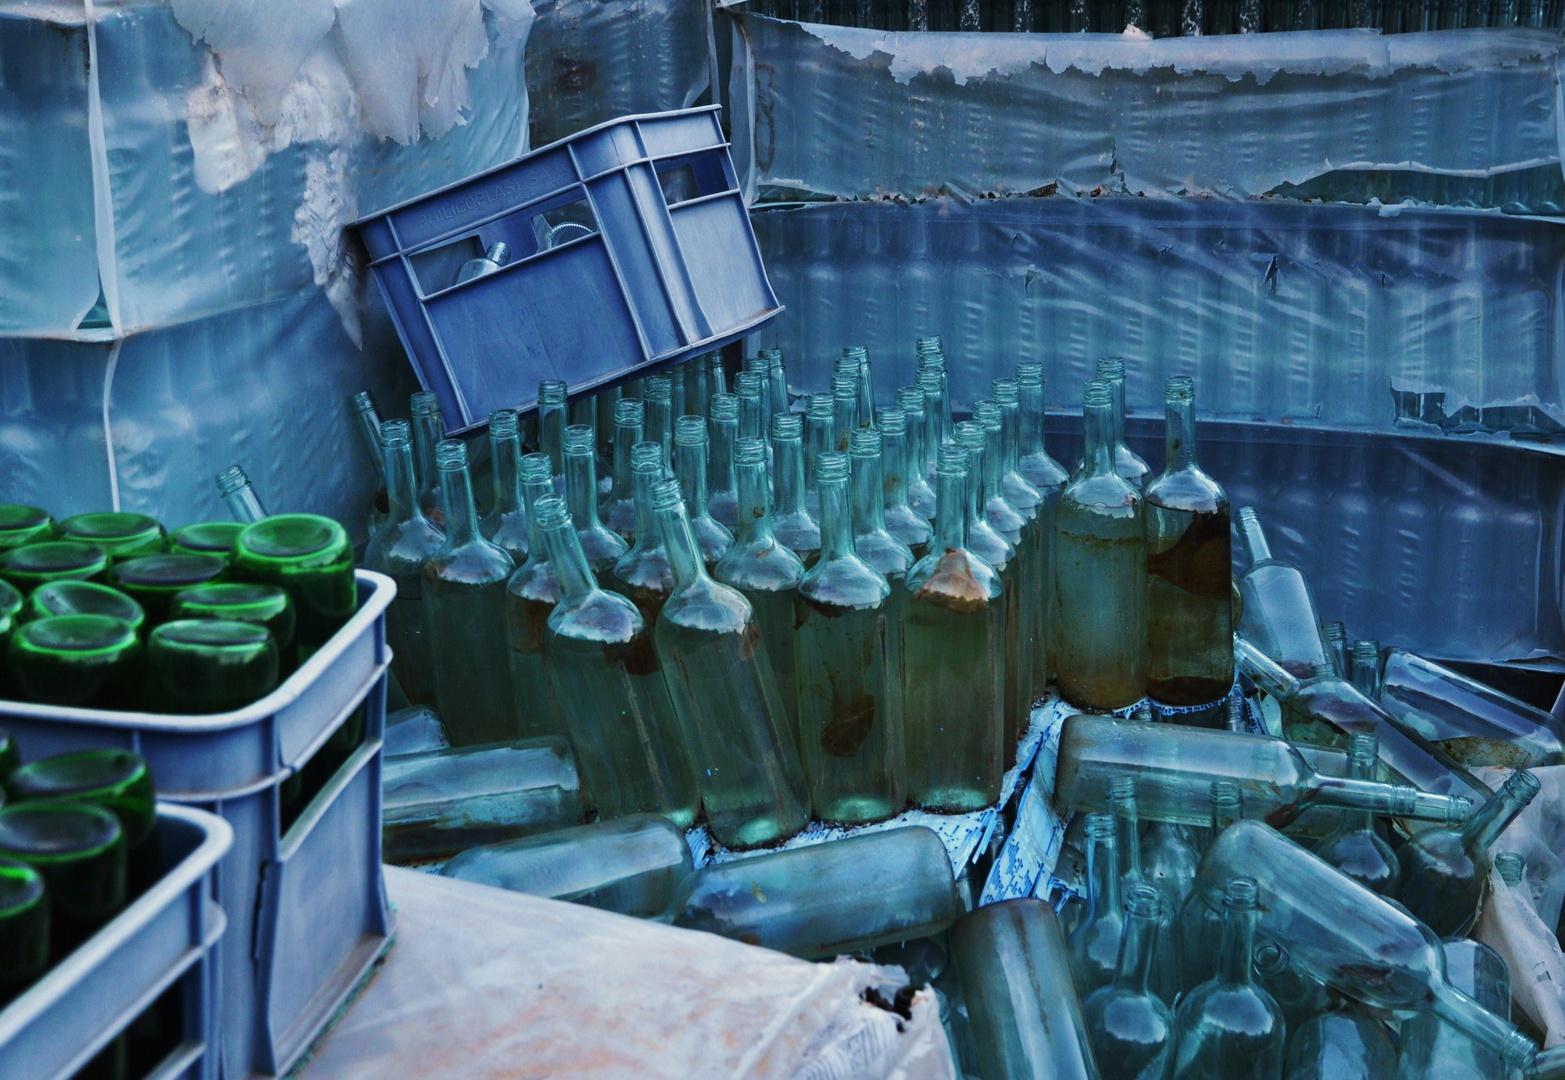 wineless bottles